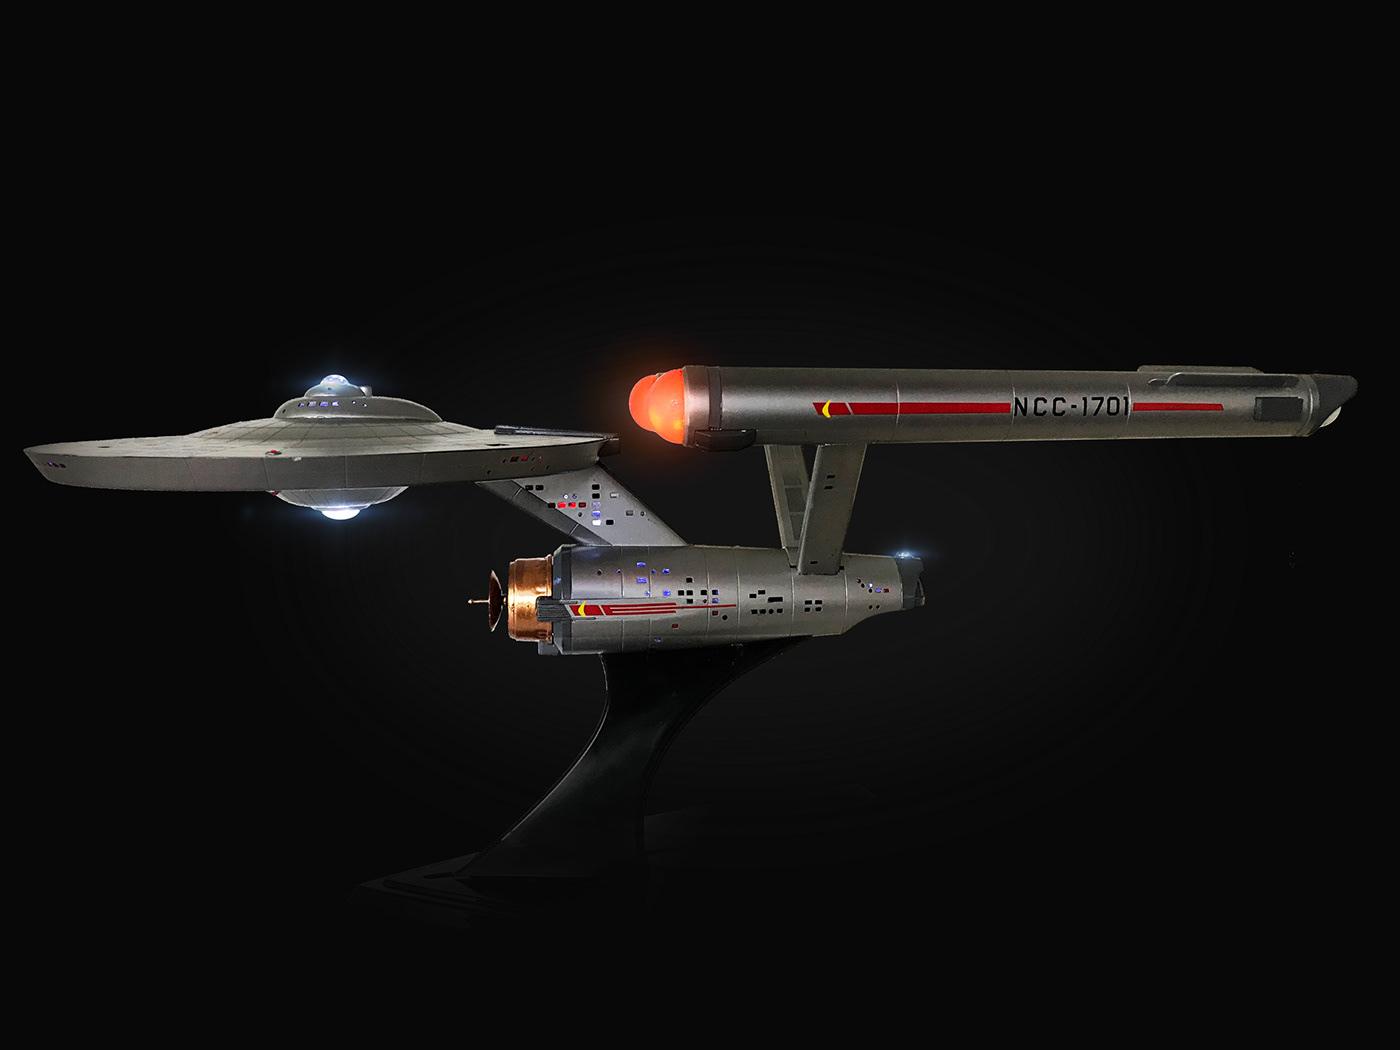 Star Trek,scale model,Original TV Series,U.S.S Enterprise